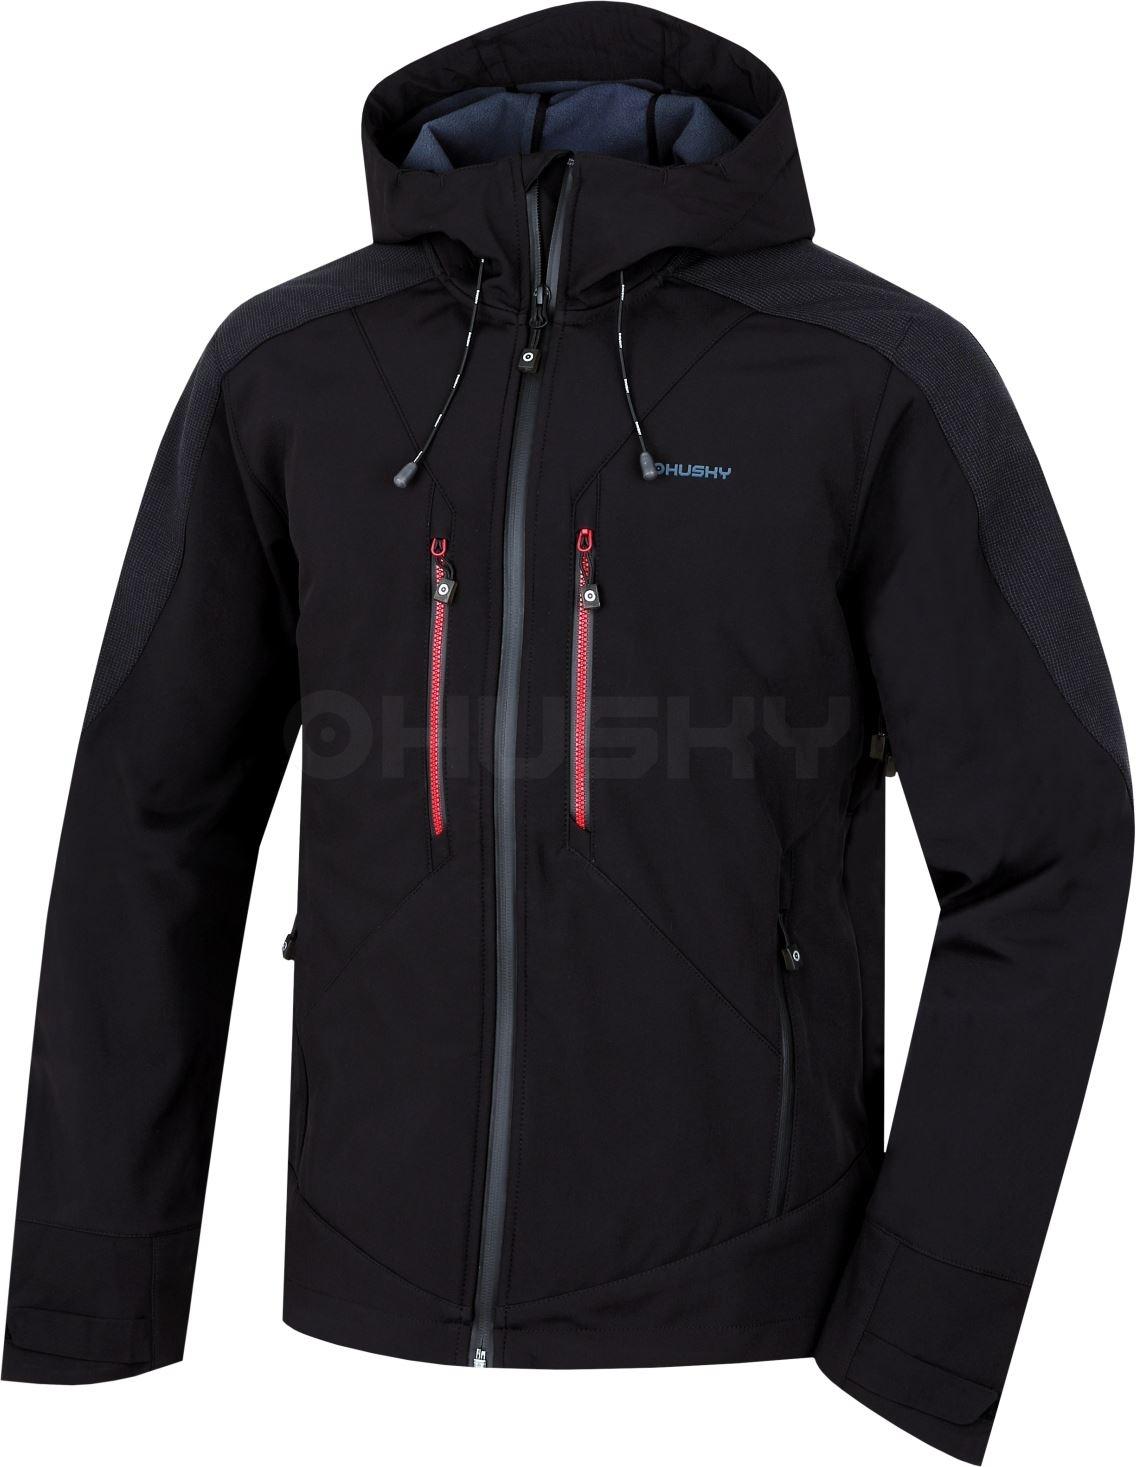 Husky Pánská softshell bunda Sevan M černá Velikost: M